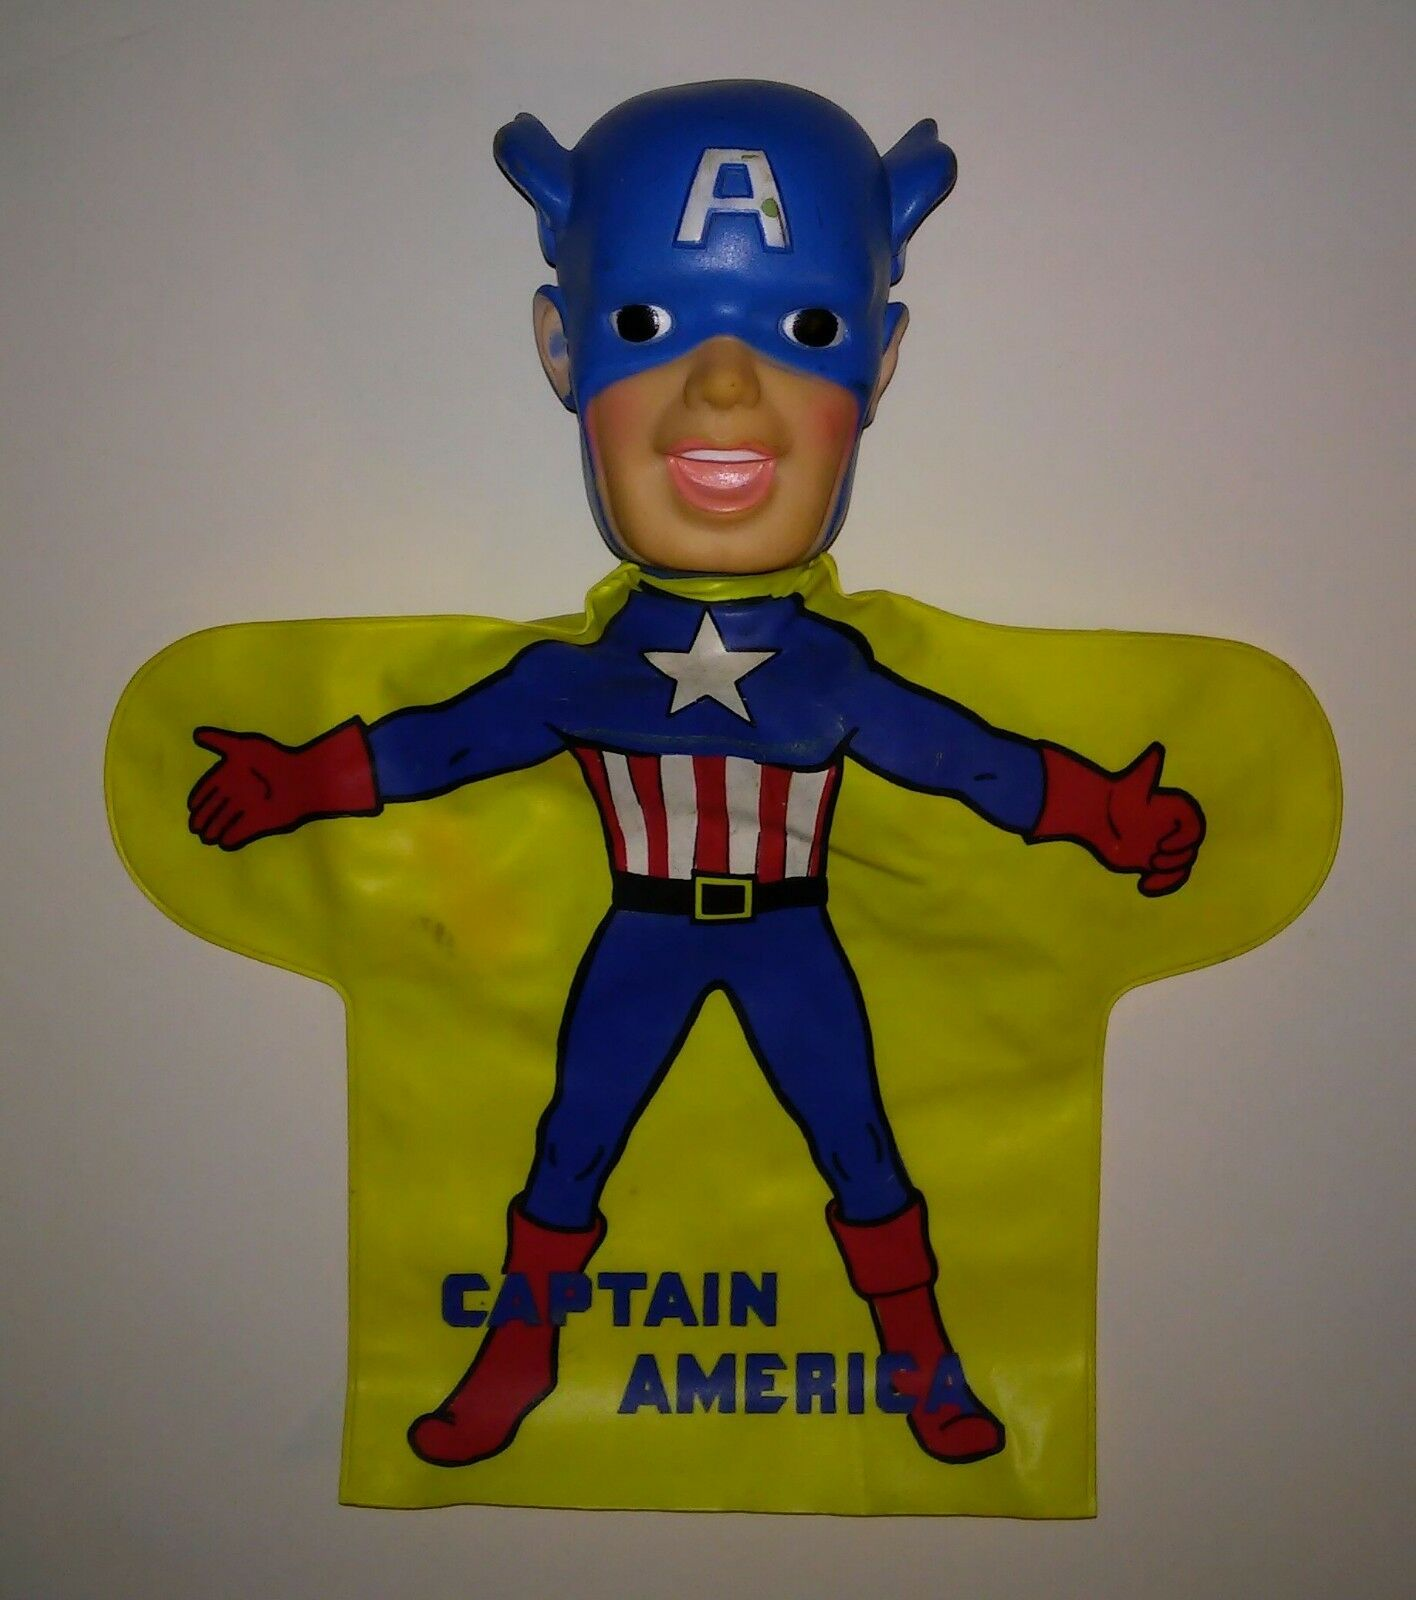 Captain America nice Hand puppet 60's era vinyl plastic hand puppet super hero